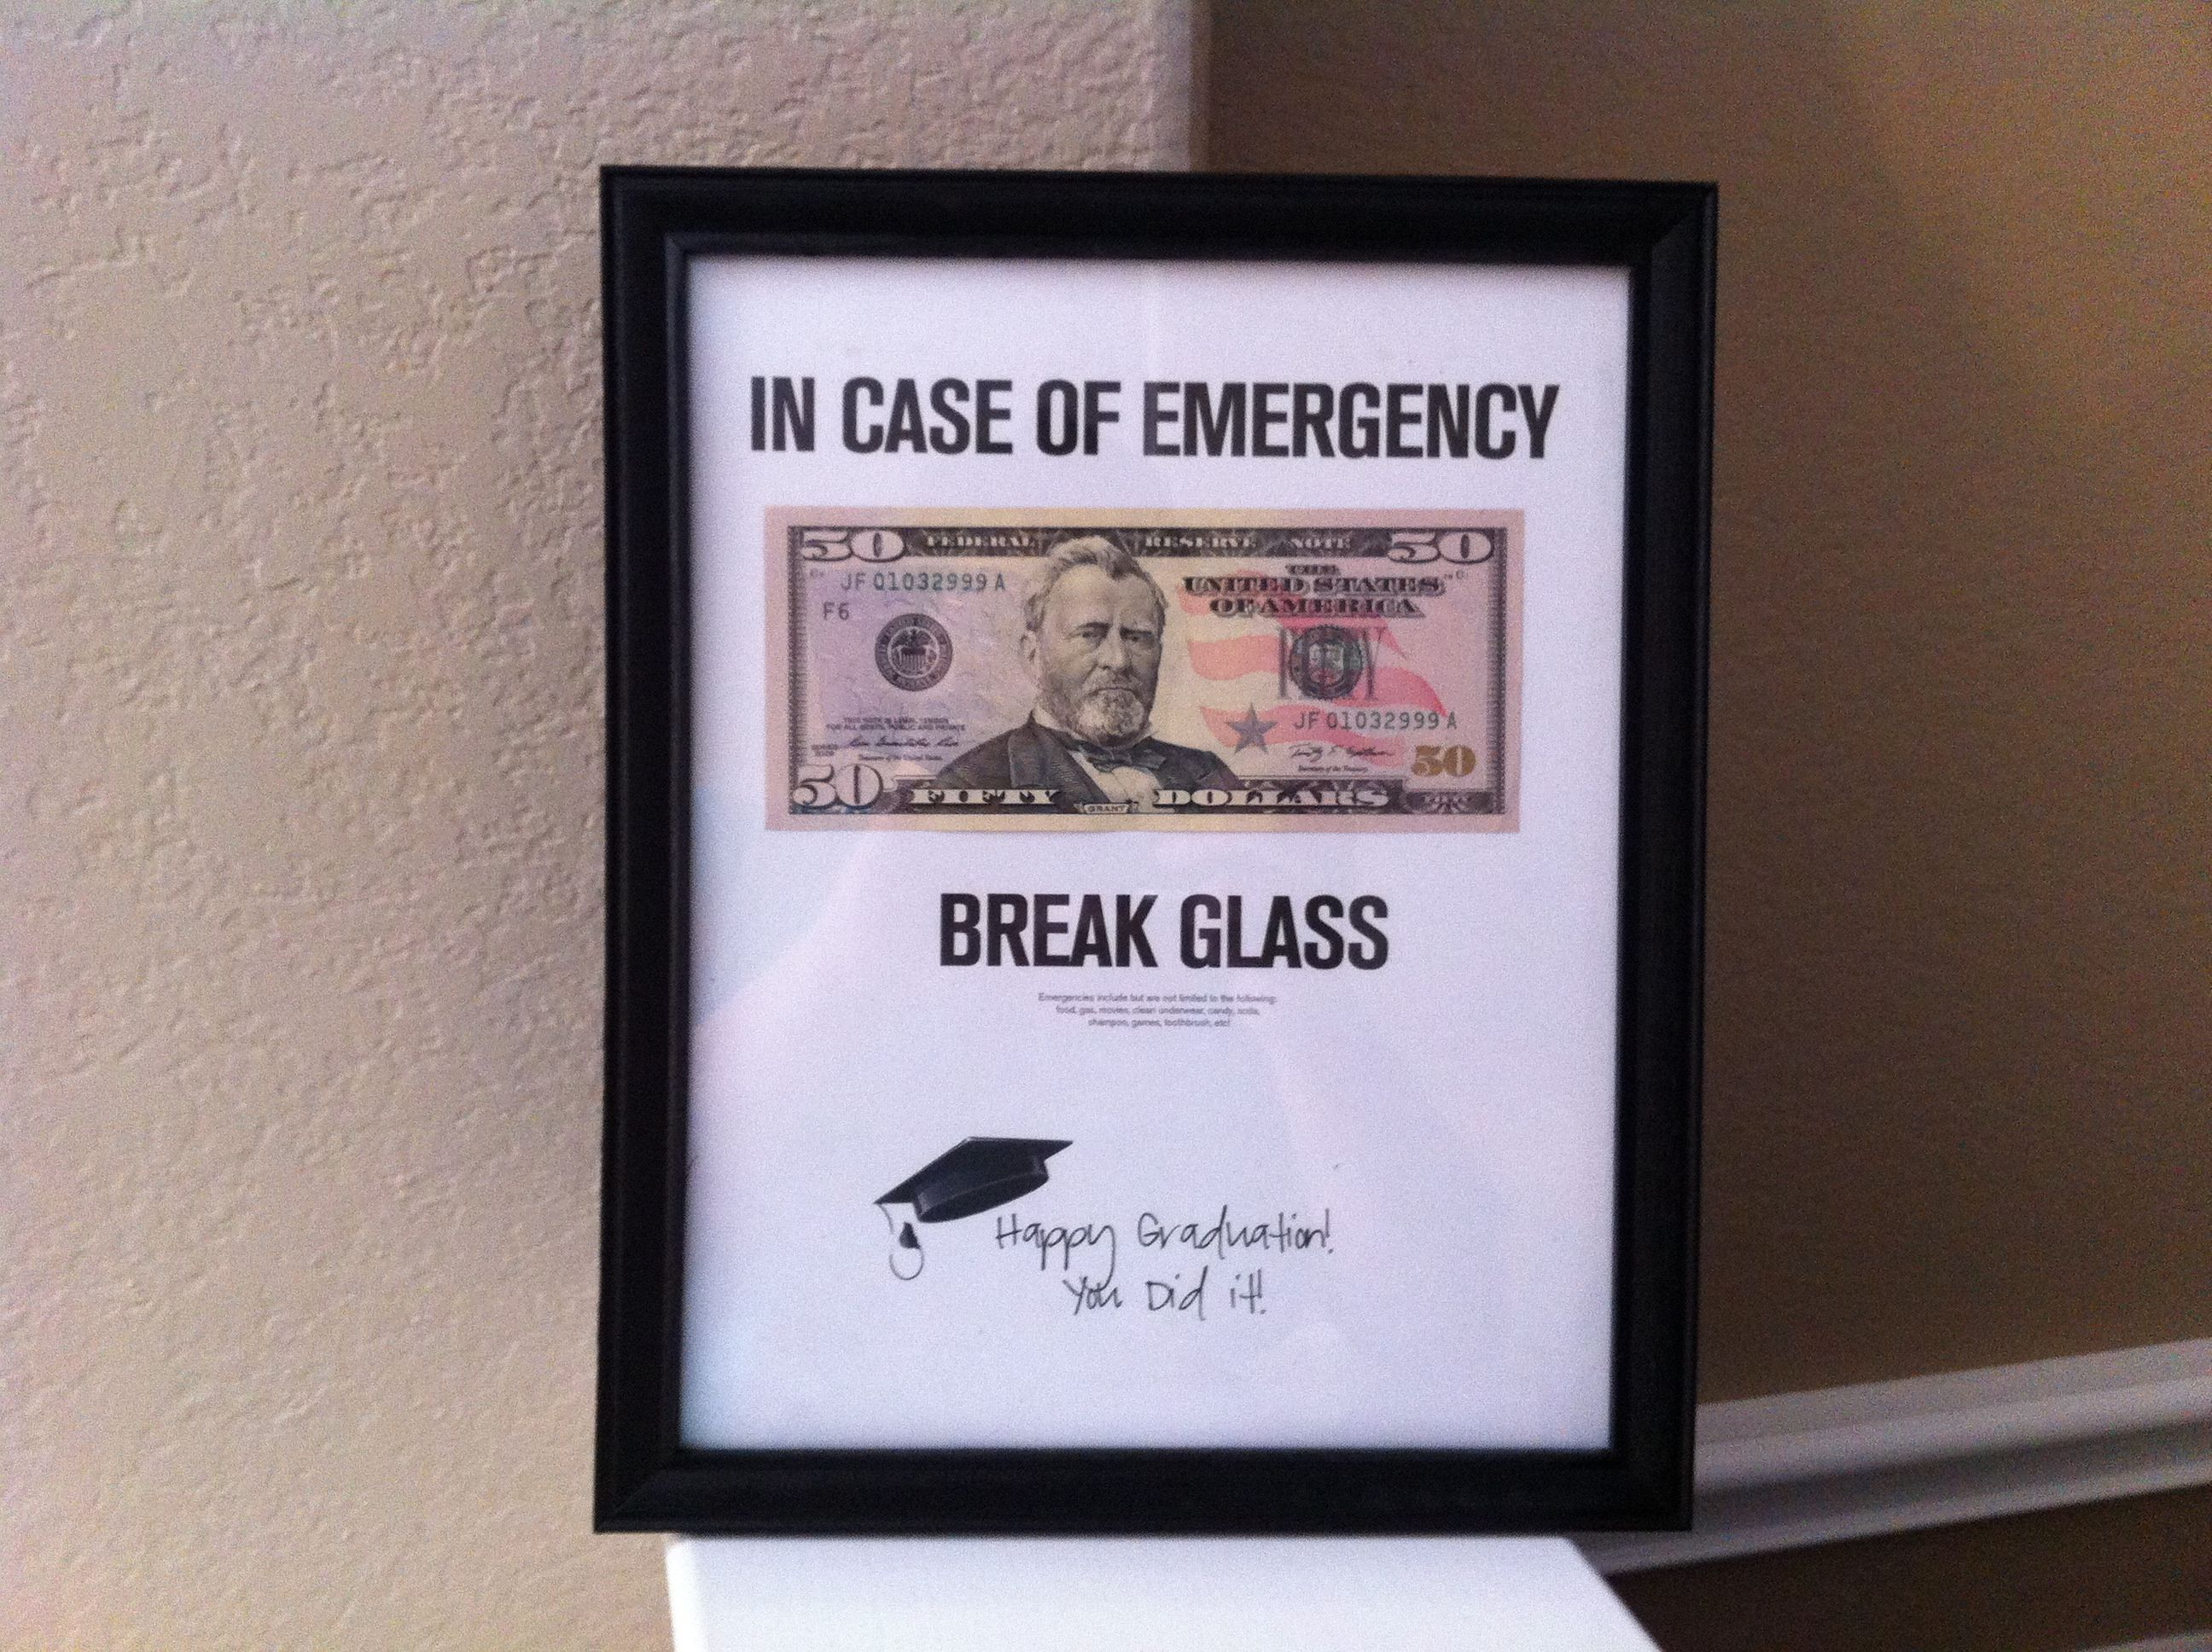 Graduation Gift Frame | DIY Crafts/Projects | Pinterest ...